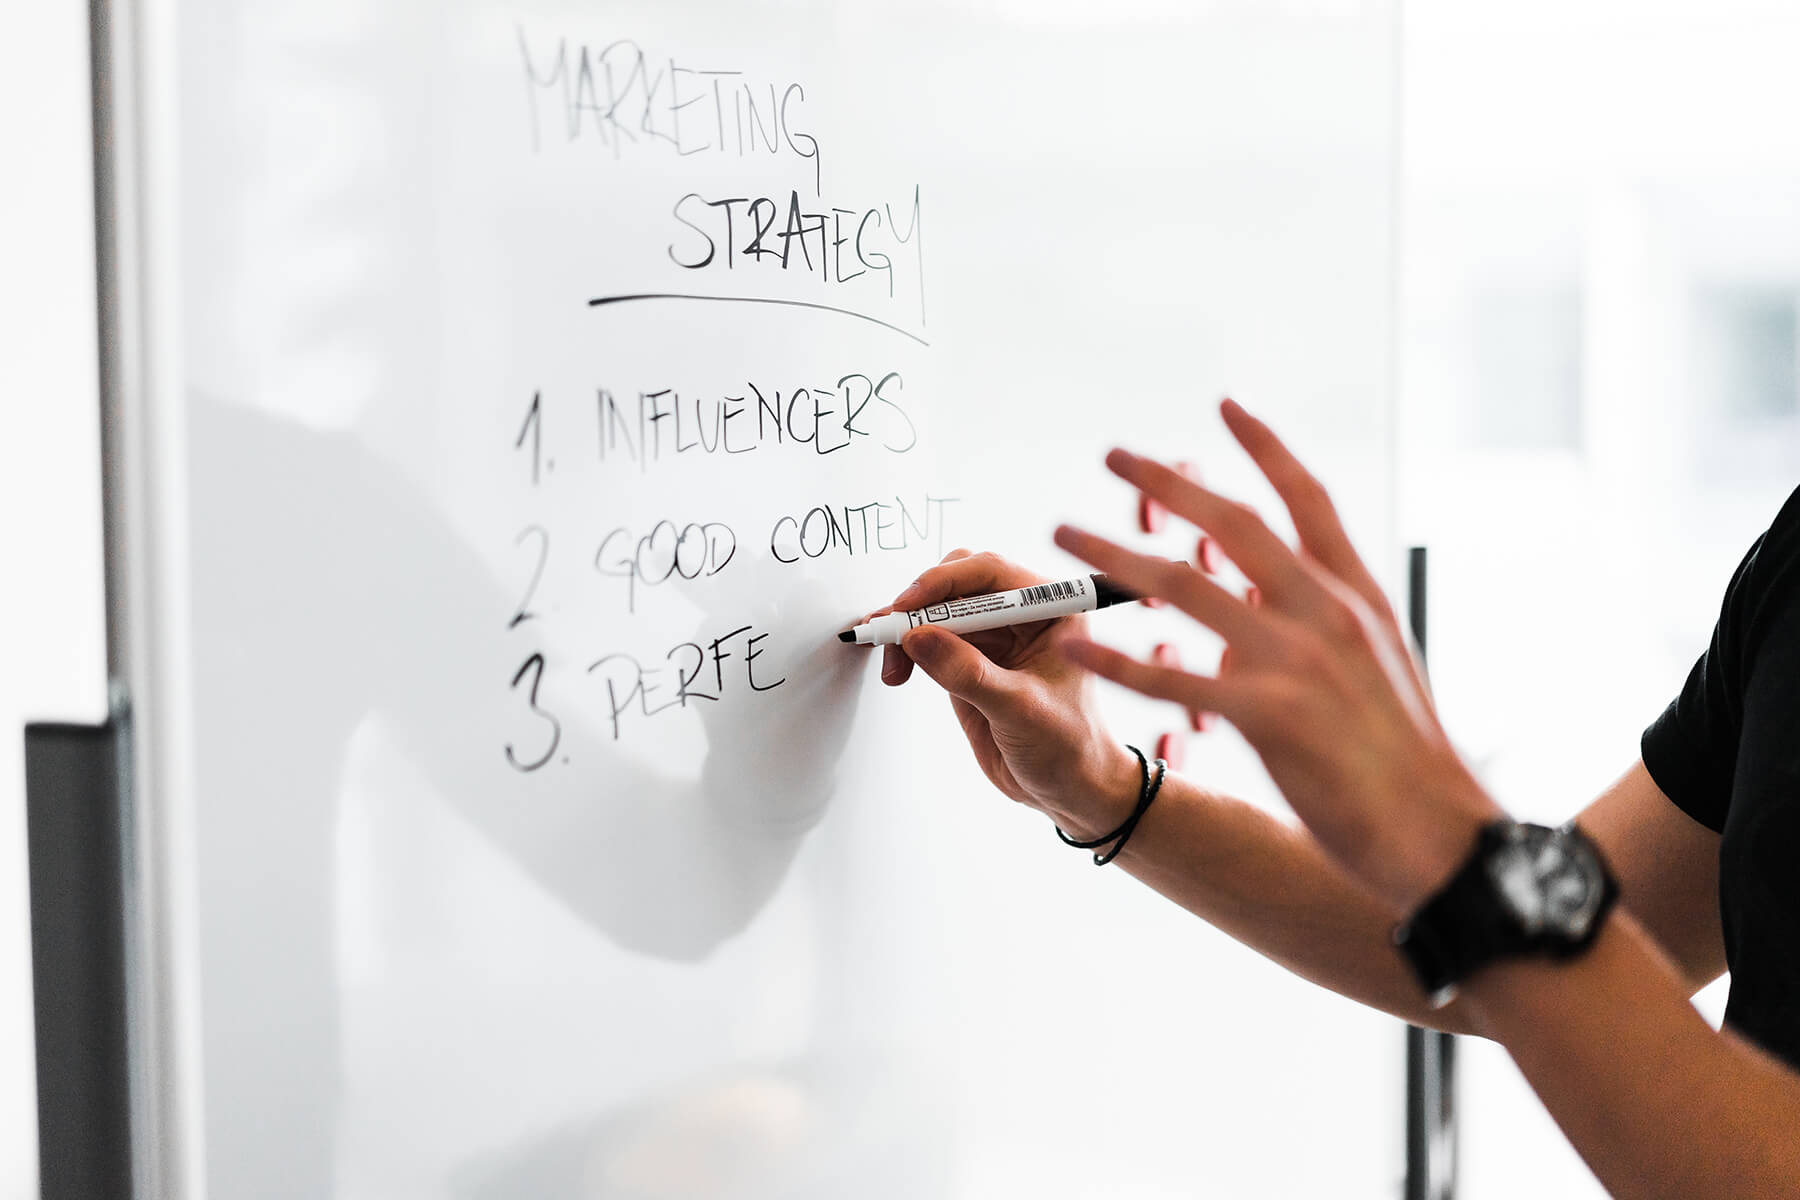 Public Relations Marketing - pr marketing and advertising strategies